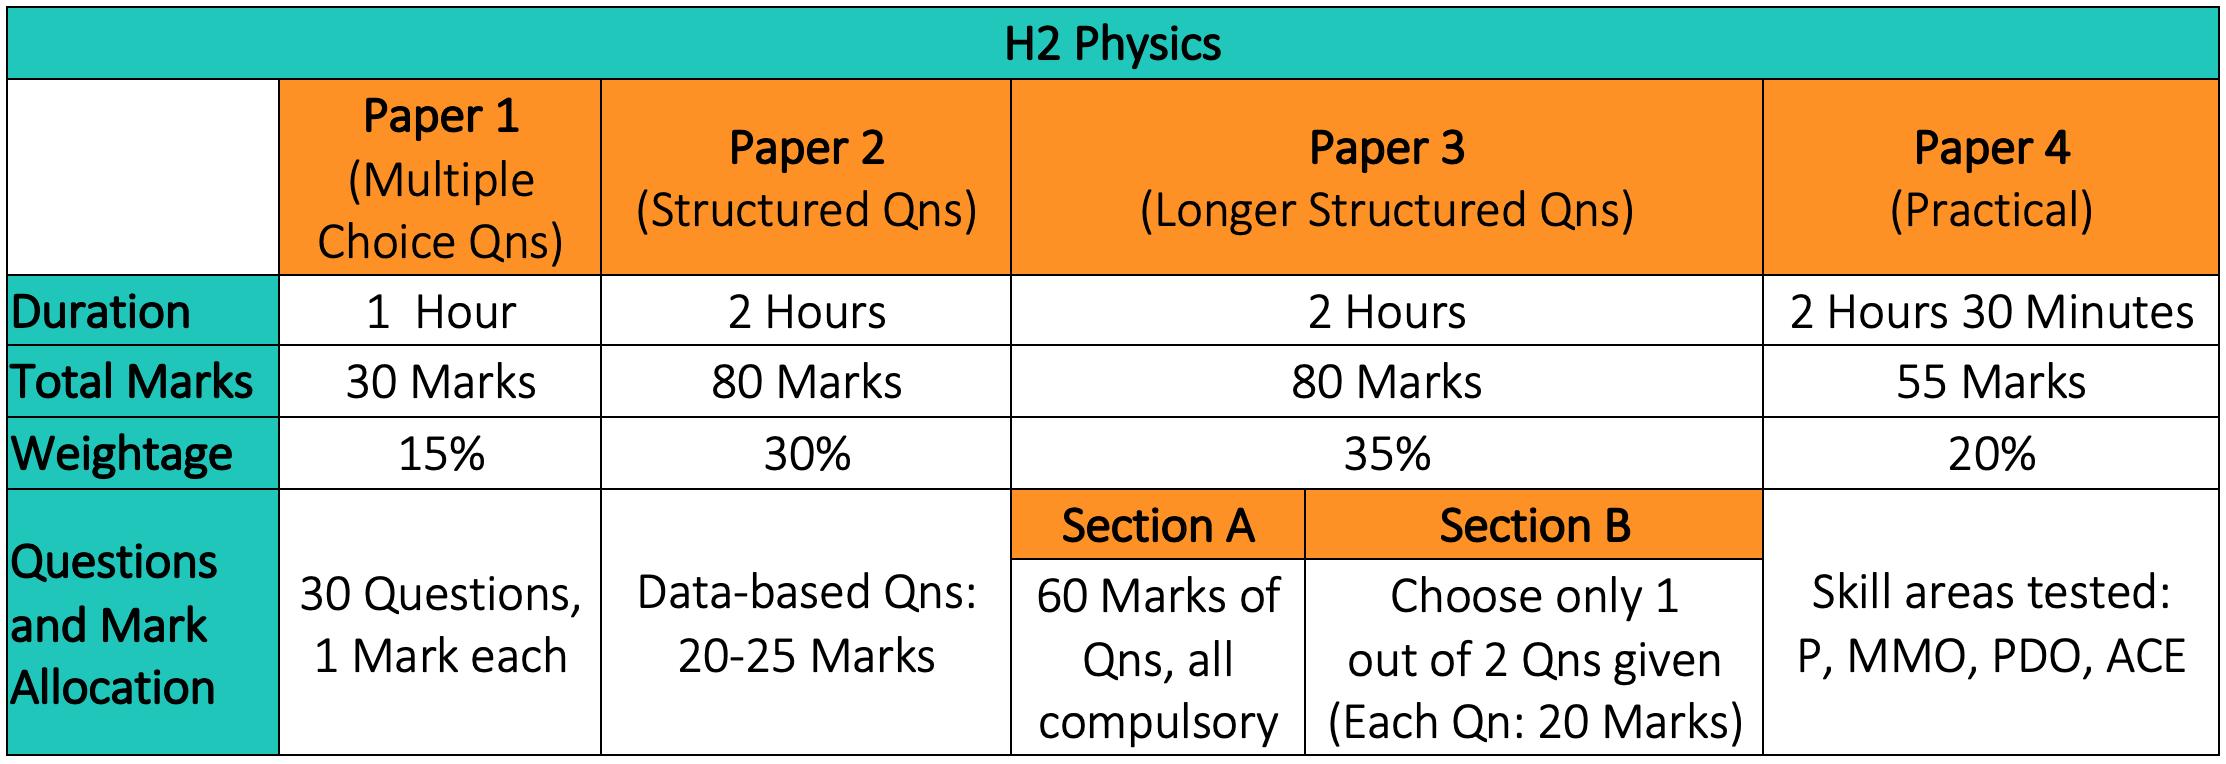 H2 Physics Examination Format